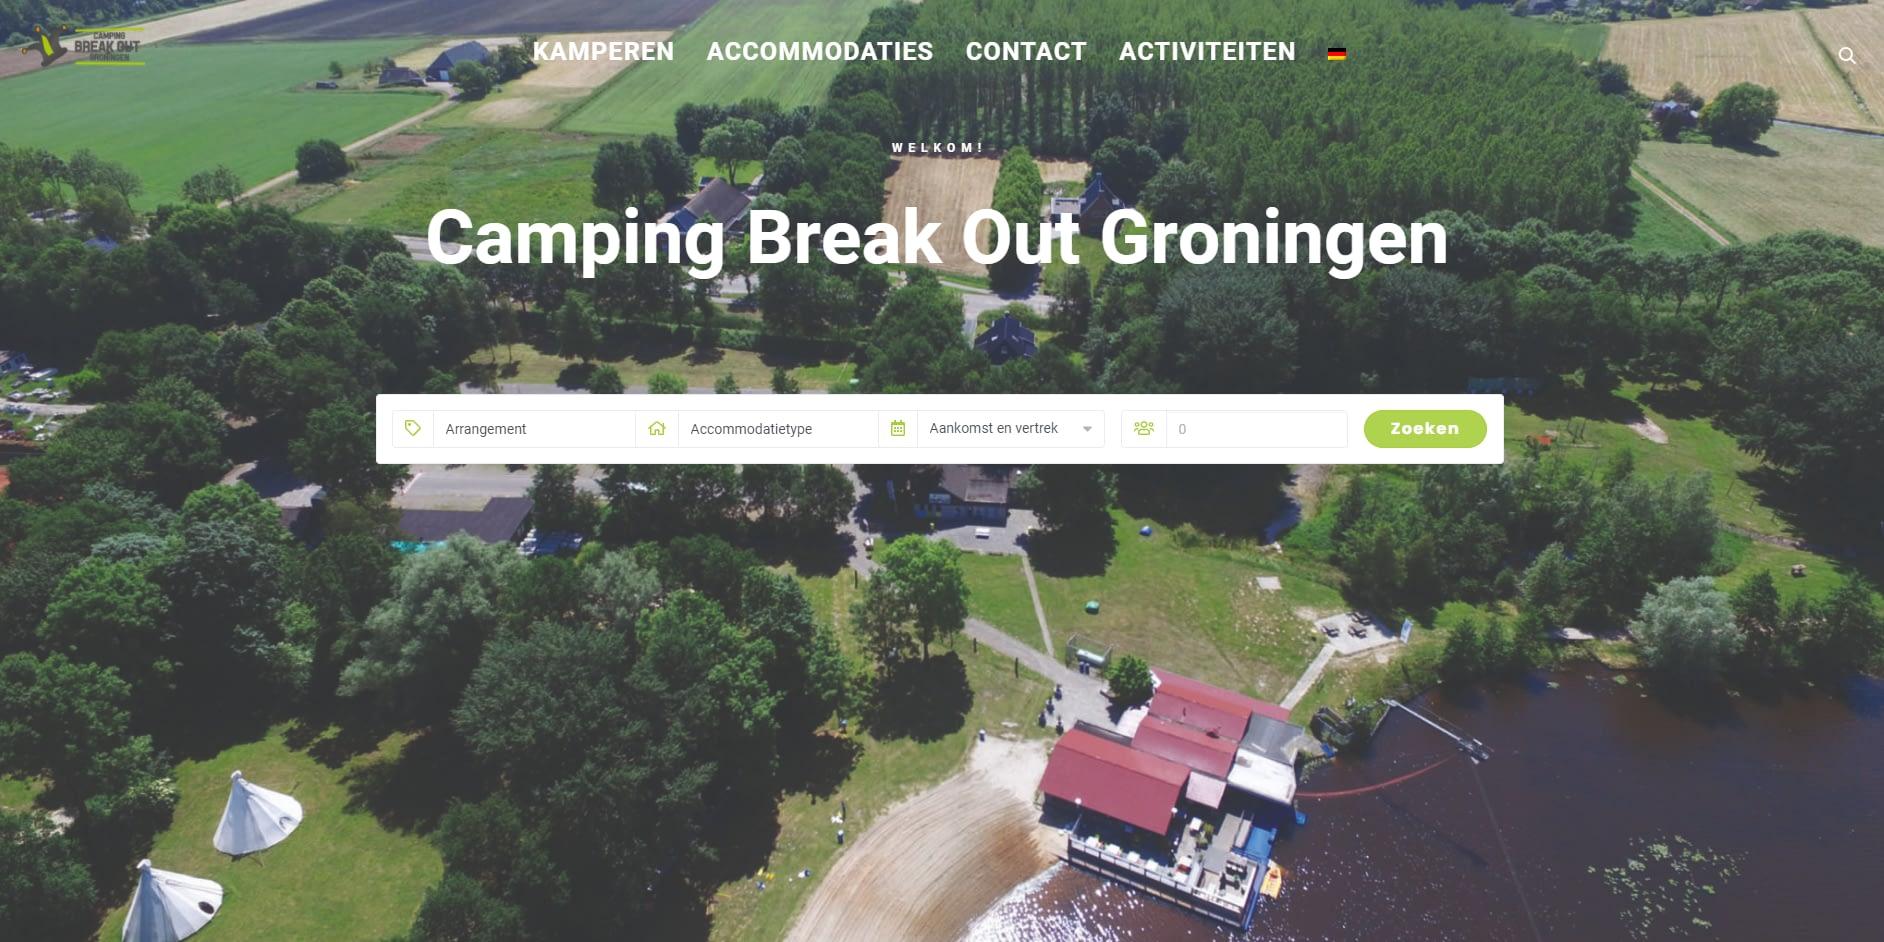 Camping Break Out Groningen